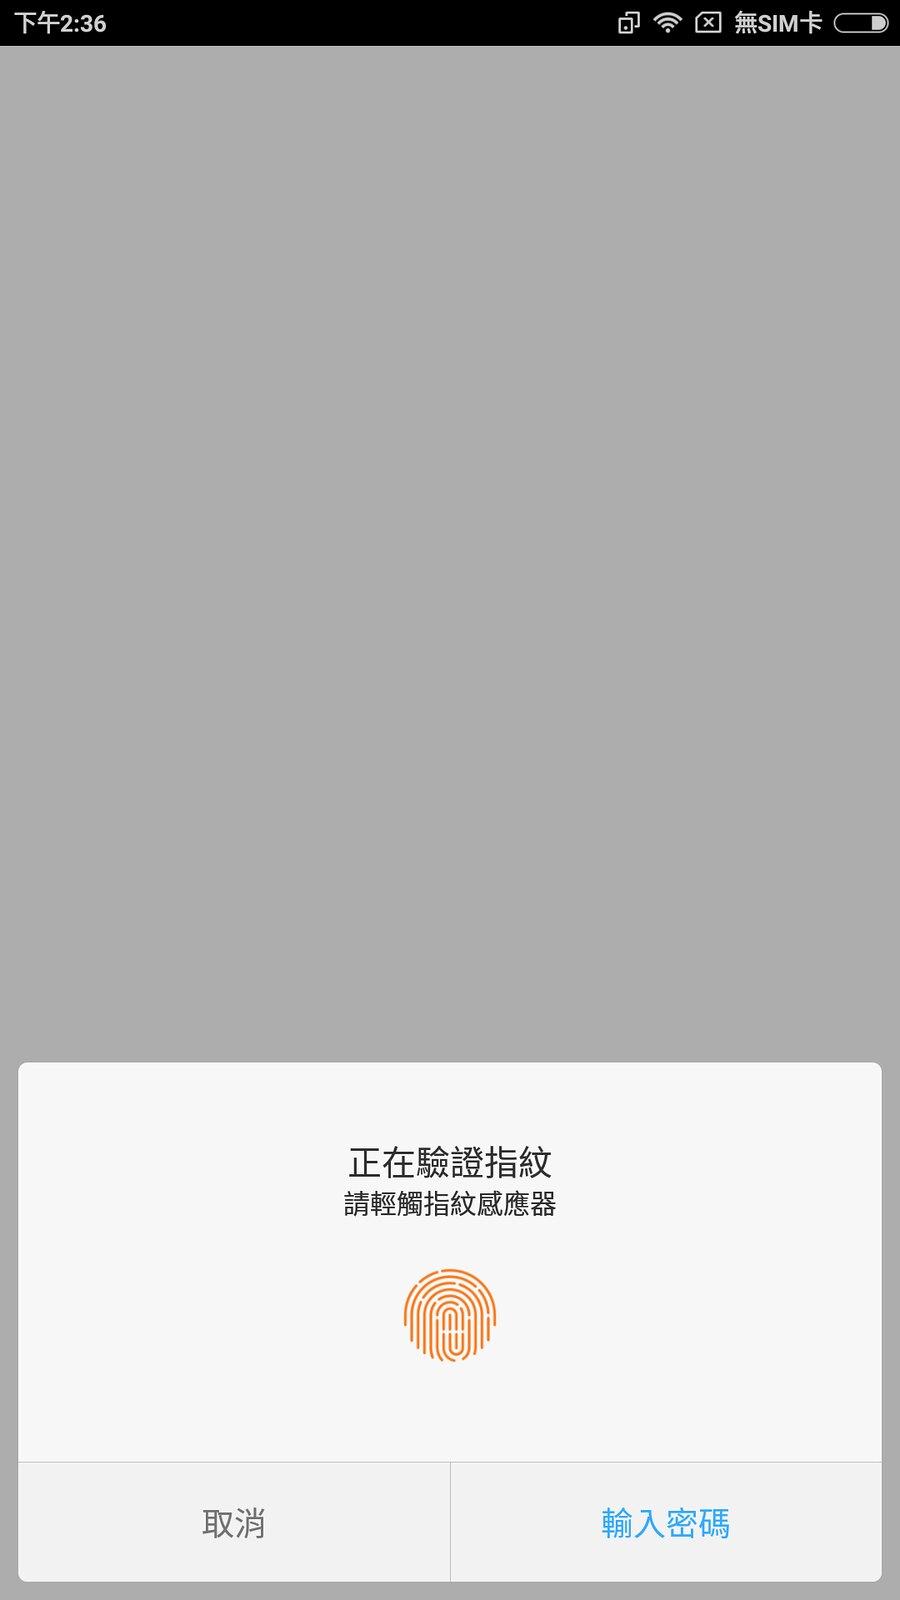 Screenshot_2016-12-04-14-36-56-627_com.android.settings